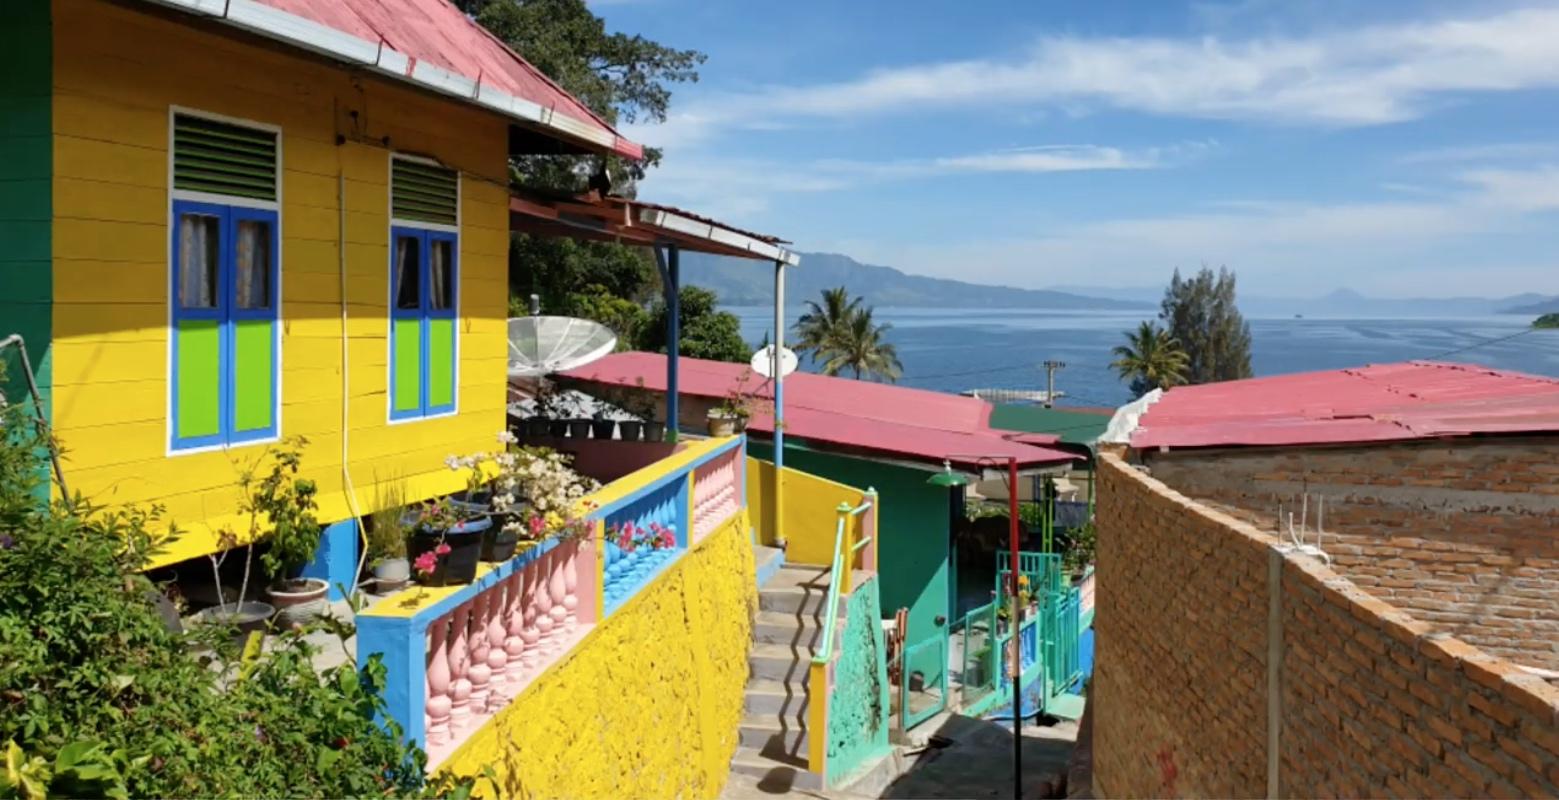 Kampung Warna-Warni Tigarihit | Foto: Shinrai26/YouTube